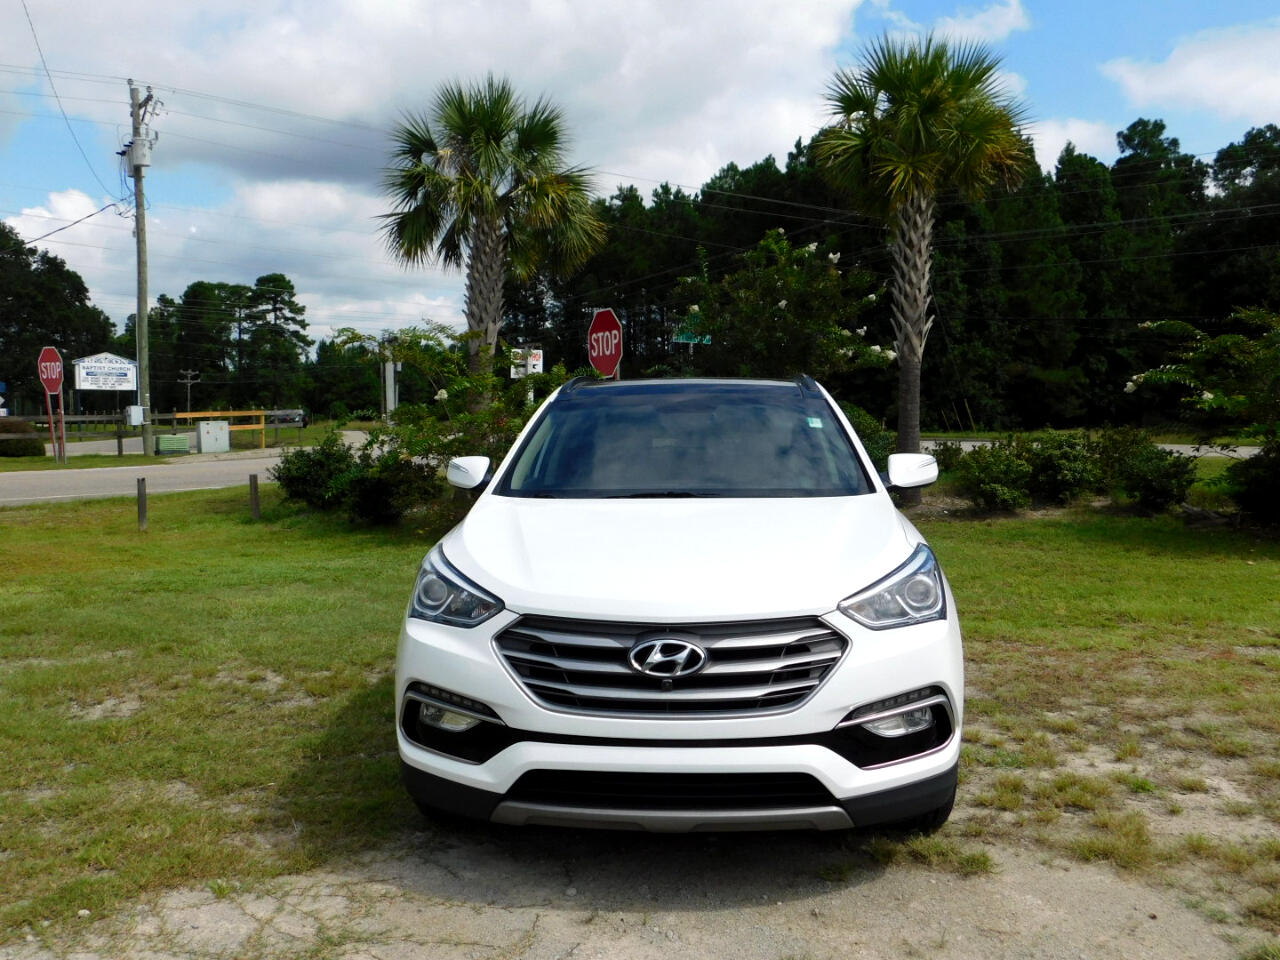 2017 Hyundai Santa Fe Sport 2.4 FWD Technology